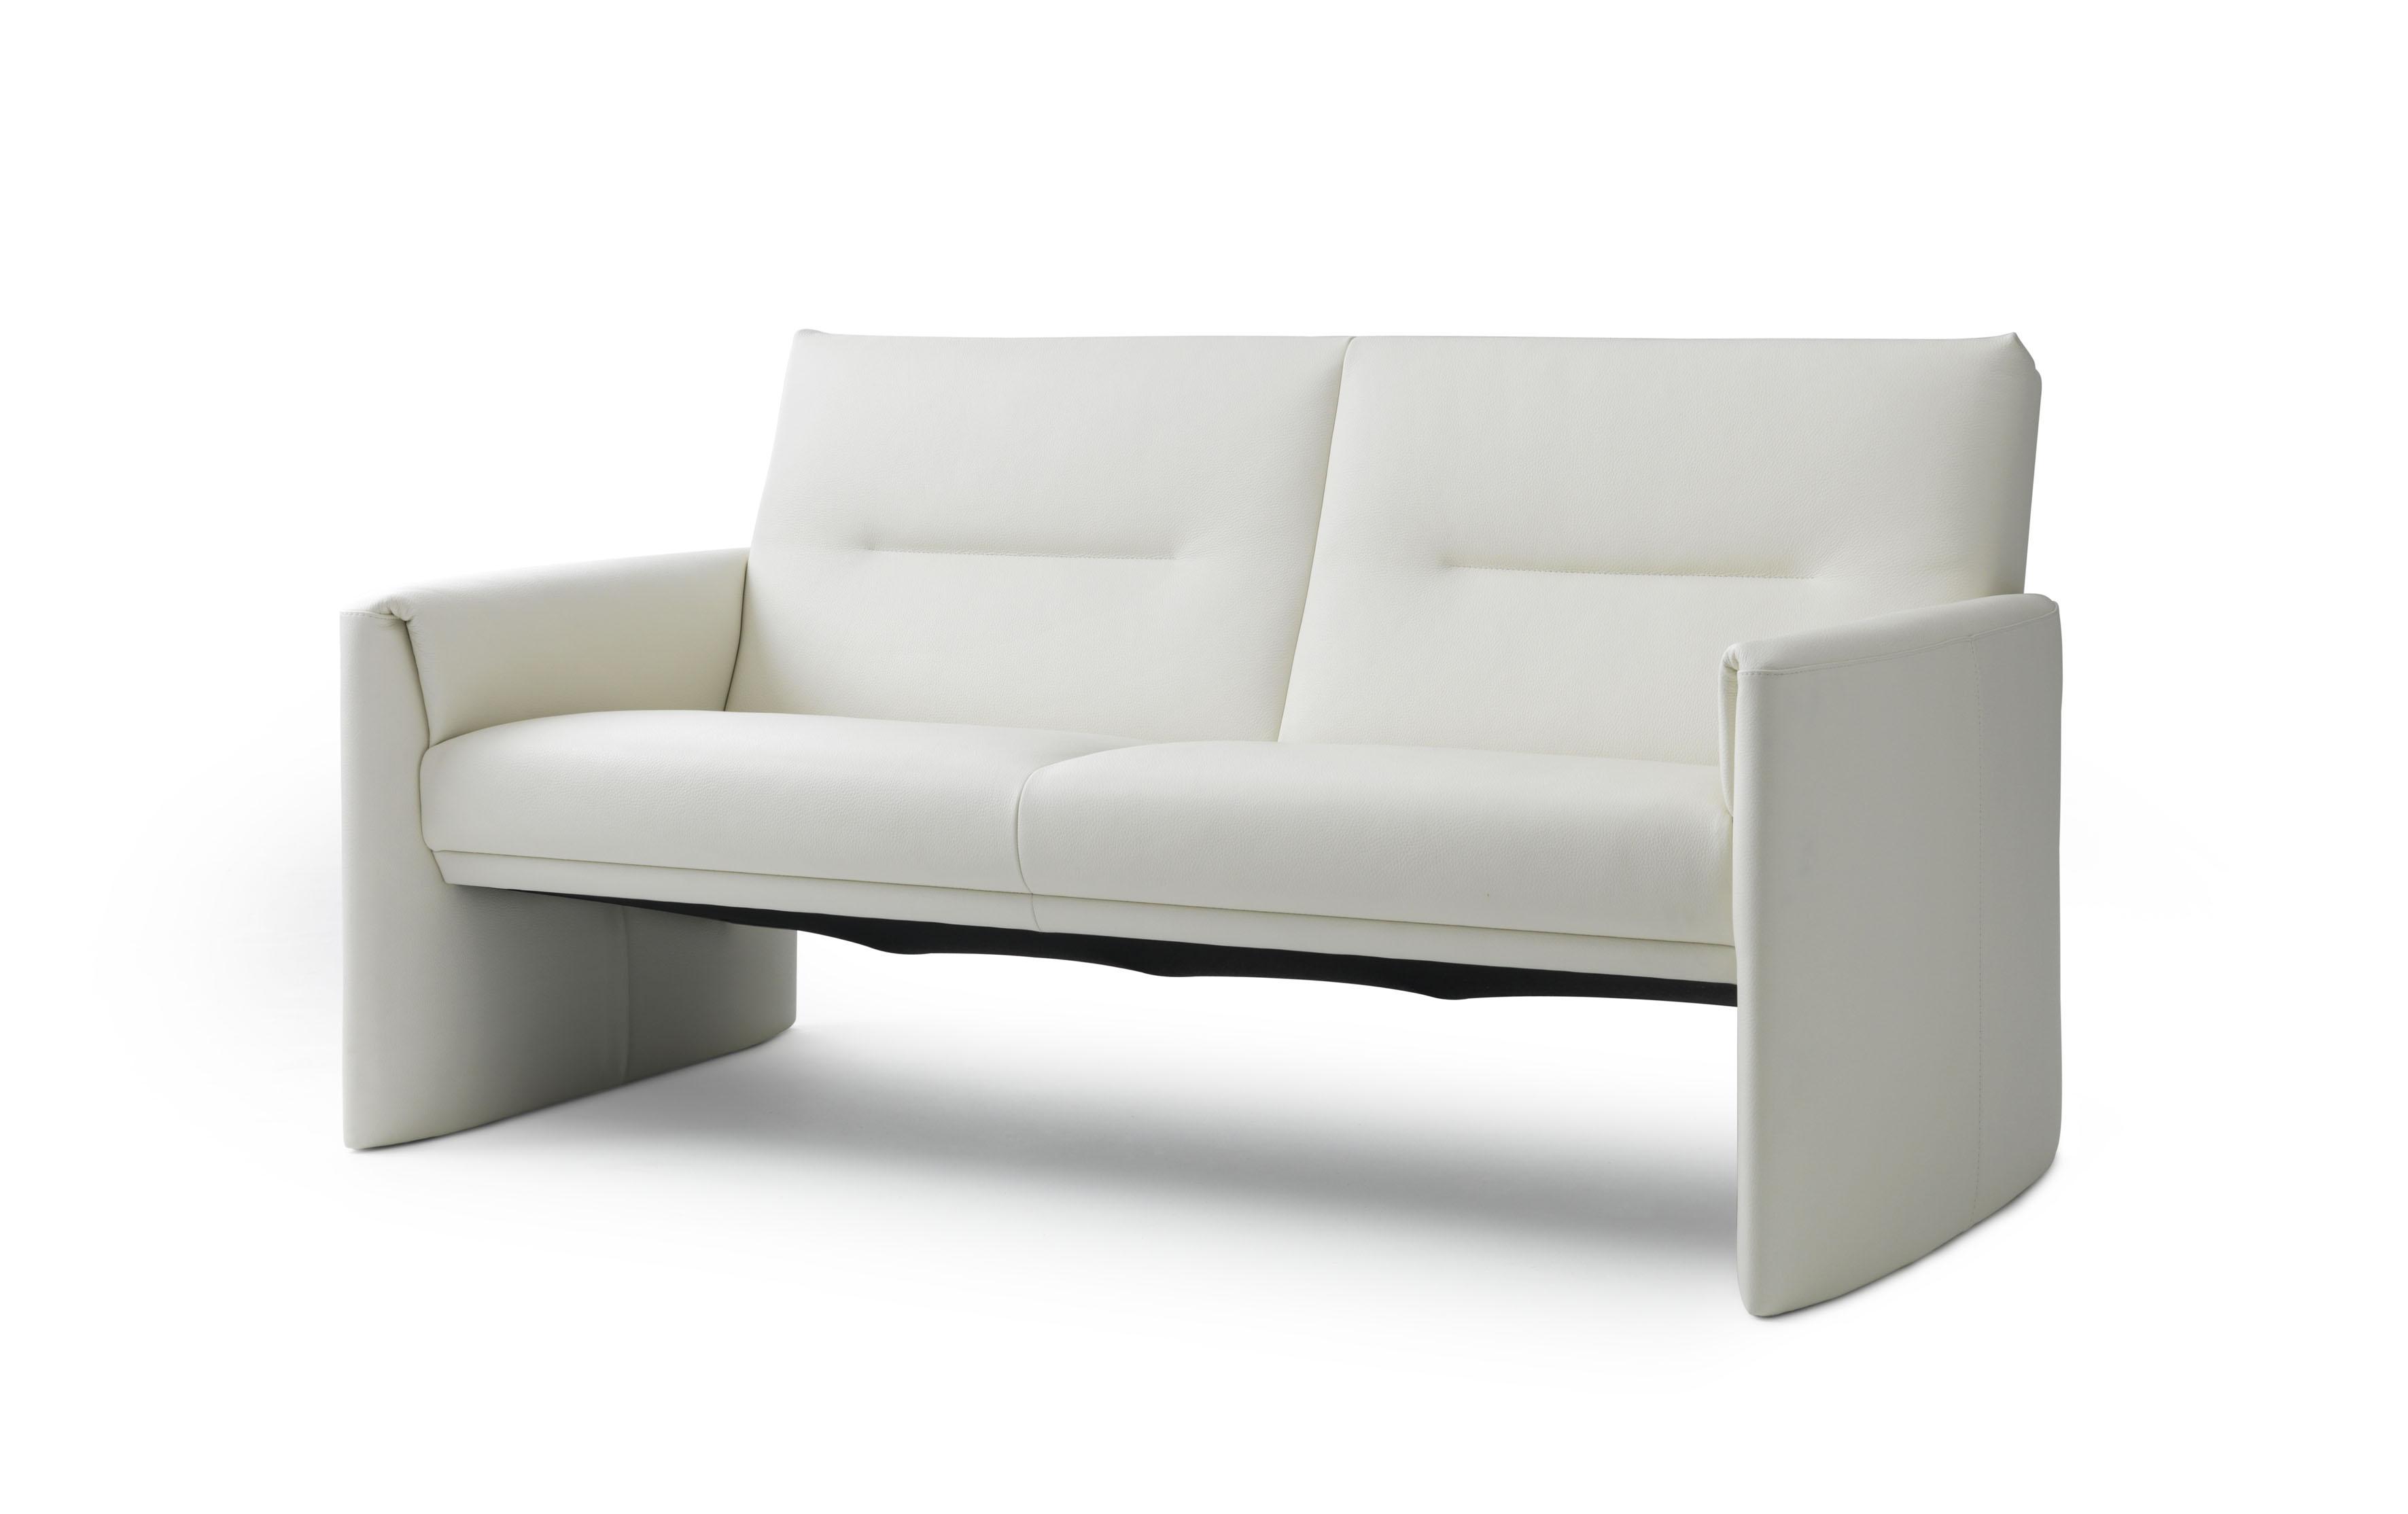 Leolux boavista 2 zits bank hoog leolux meubelen specialist